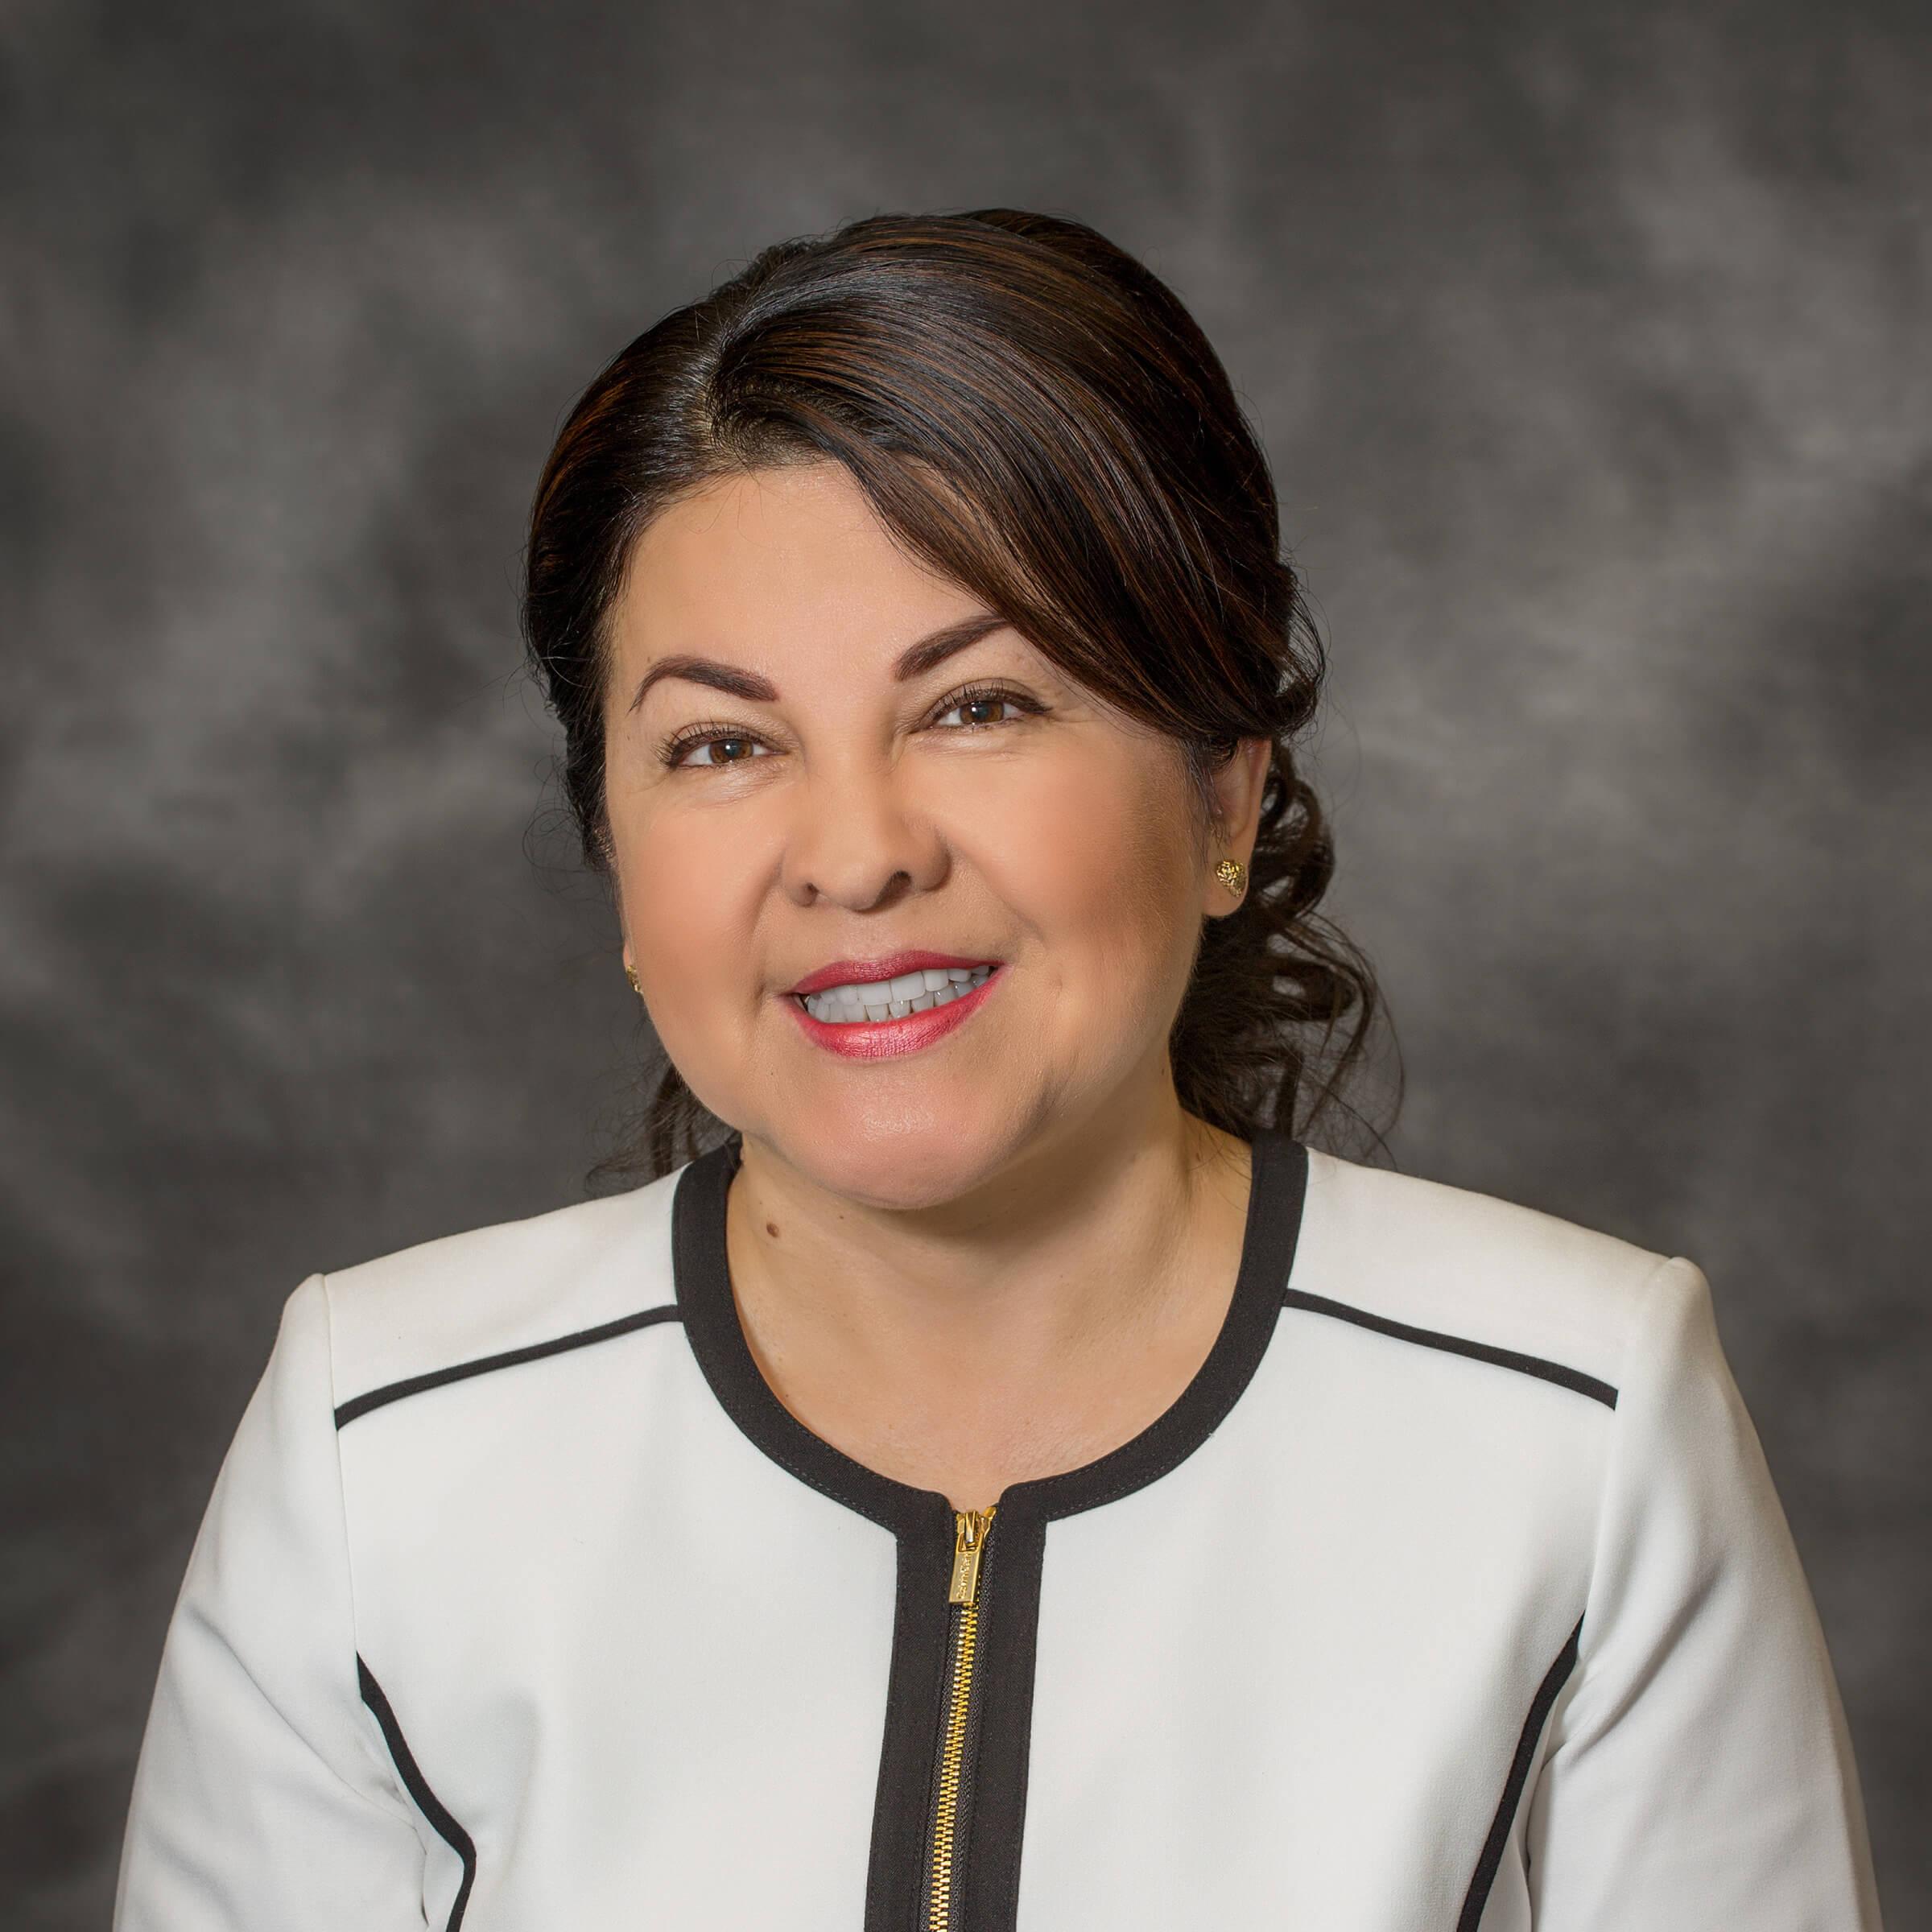 Dr. Lita Rodriguez, DDS